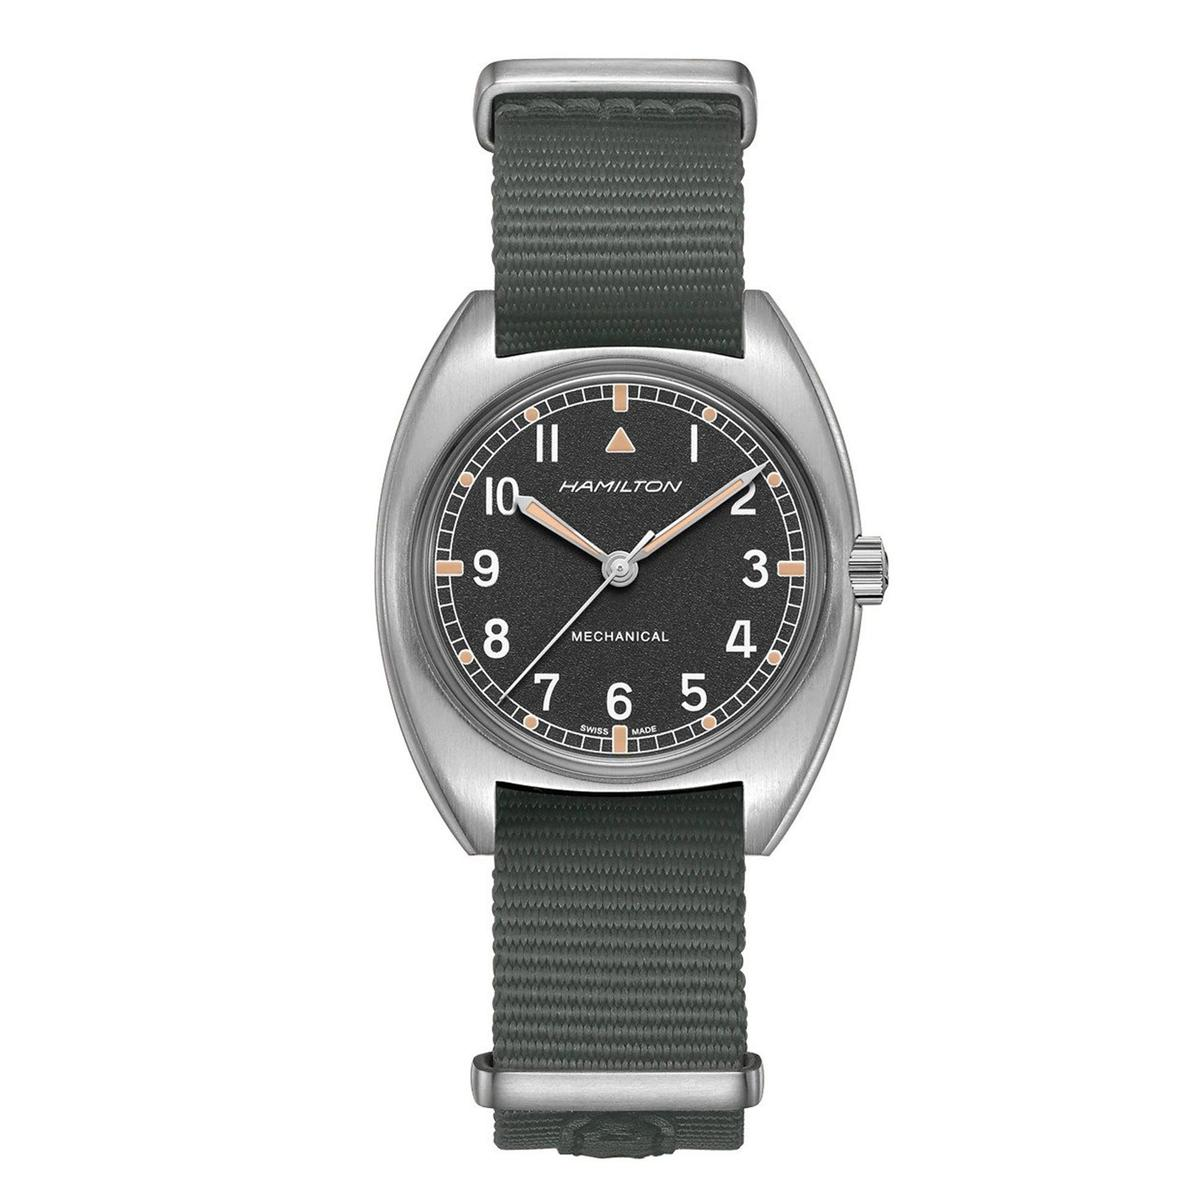 Pilot Pioneer手上鏈腕錶,建議售價NT$25,900。